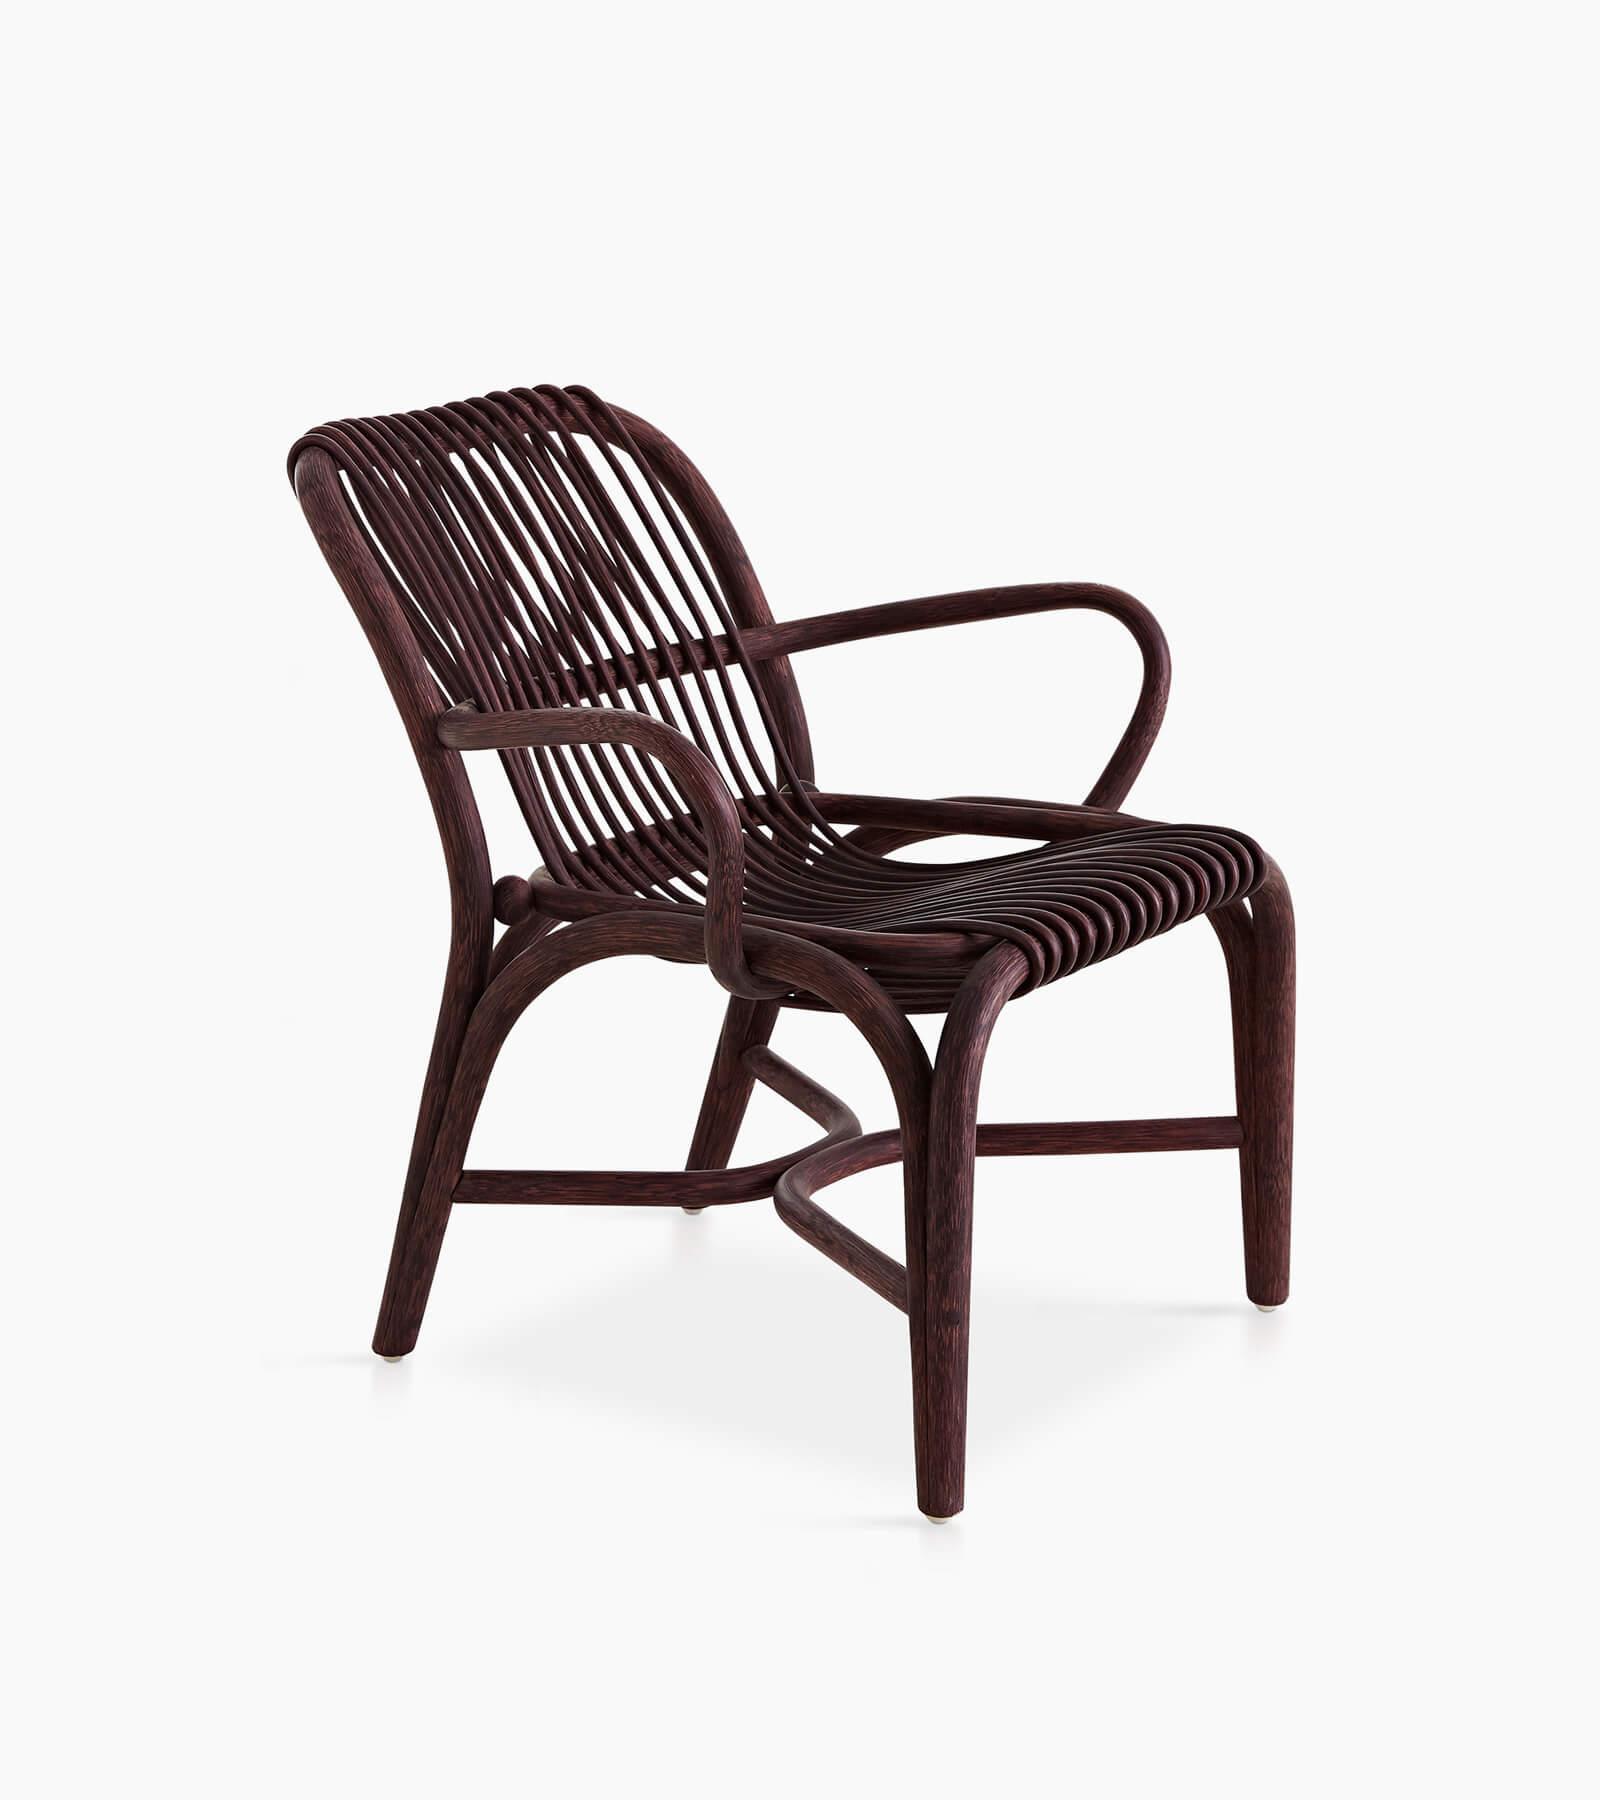 TinnappleMetz-Expormim-fontal-armchair-01